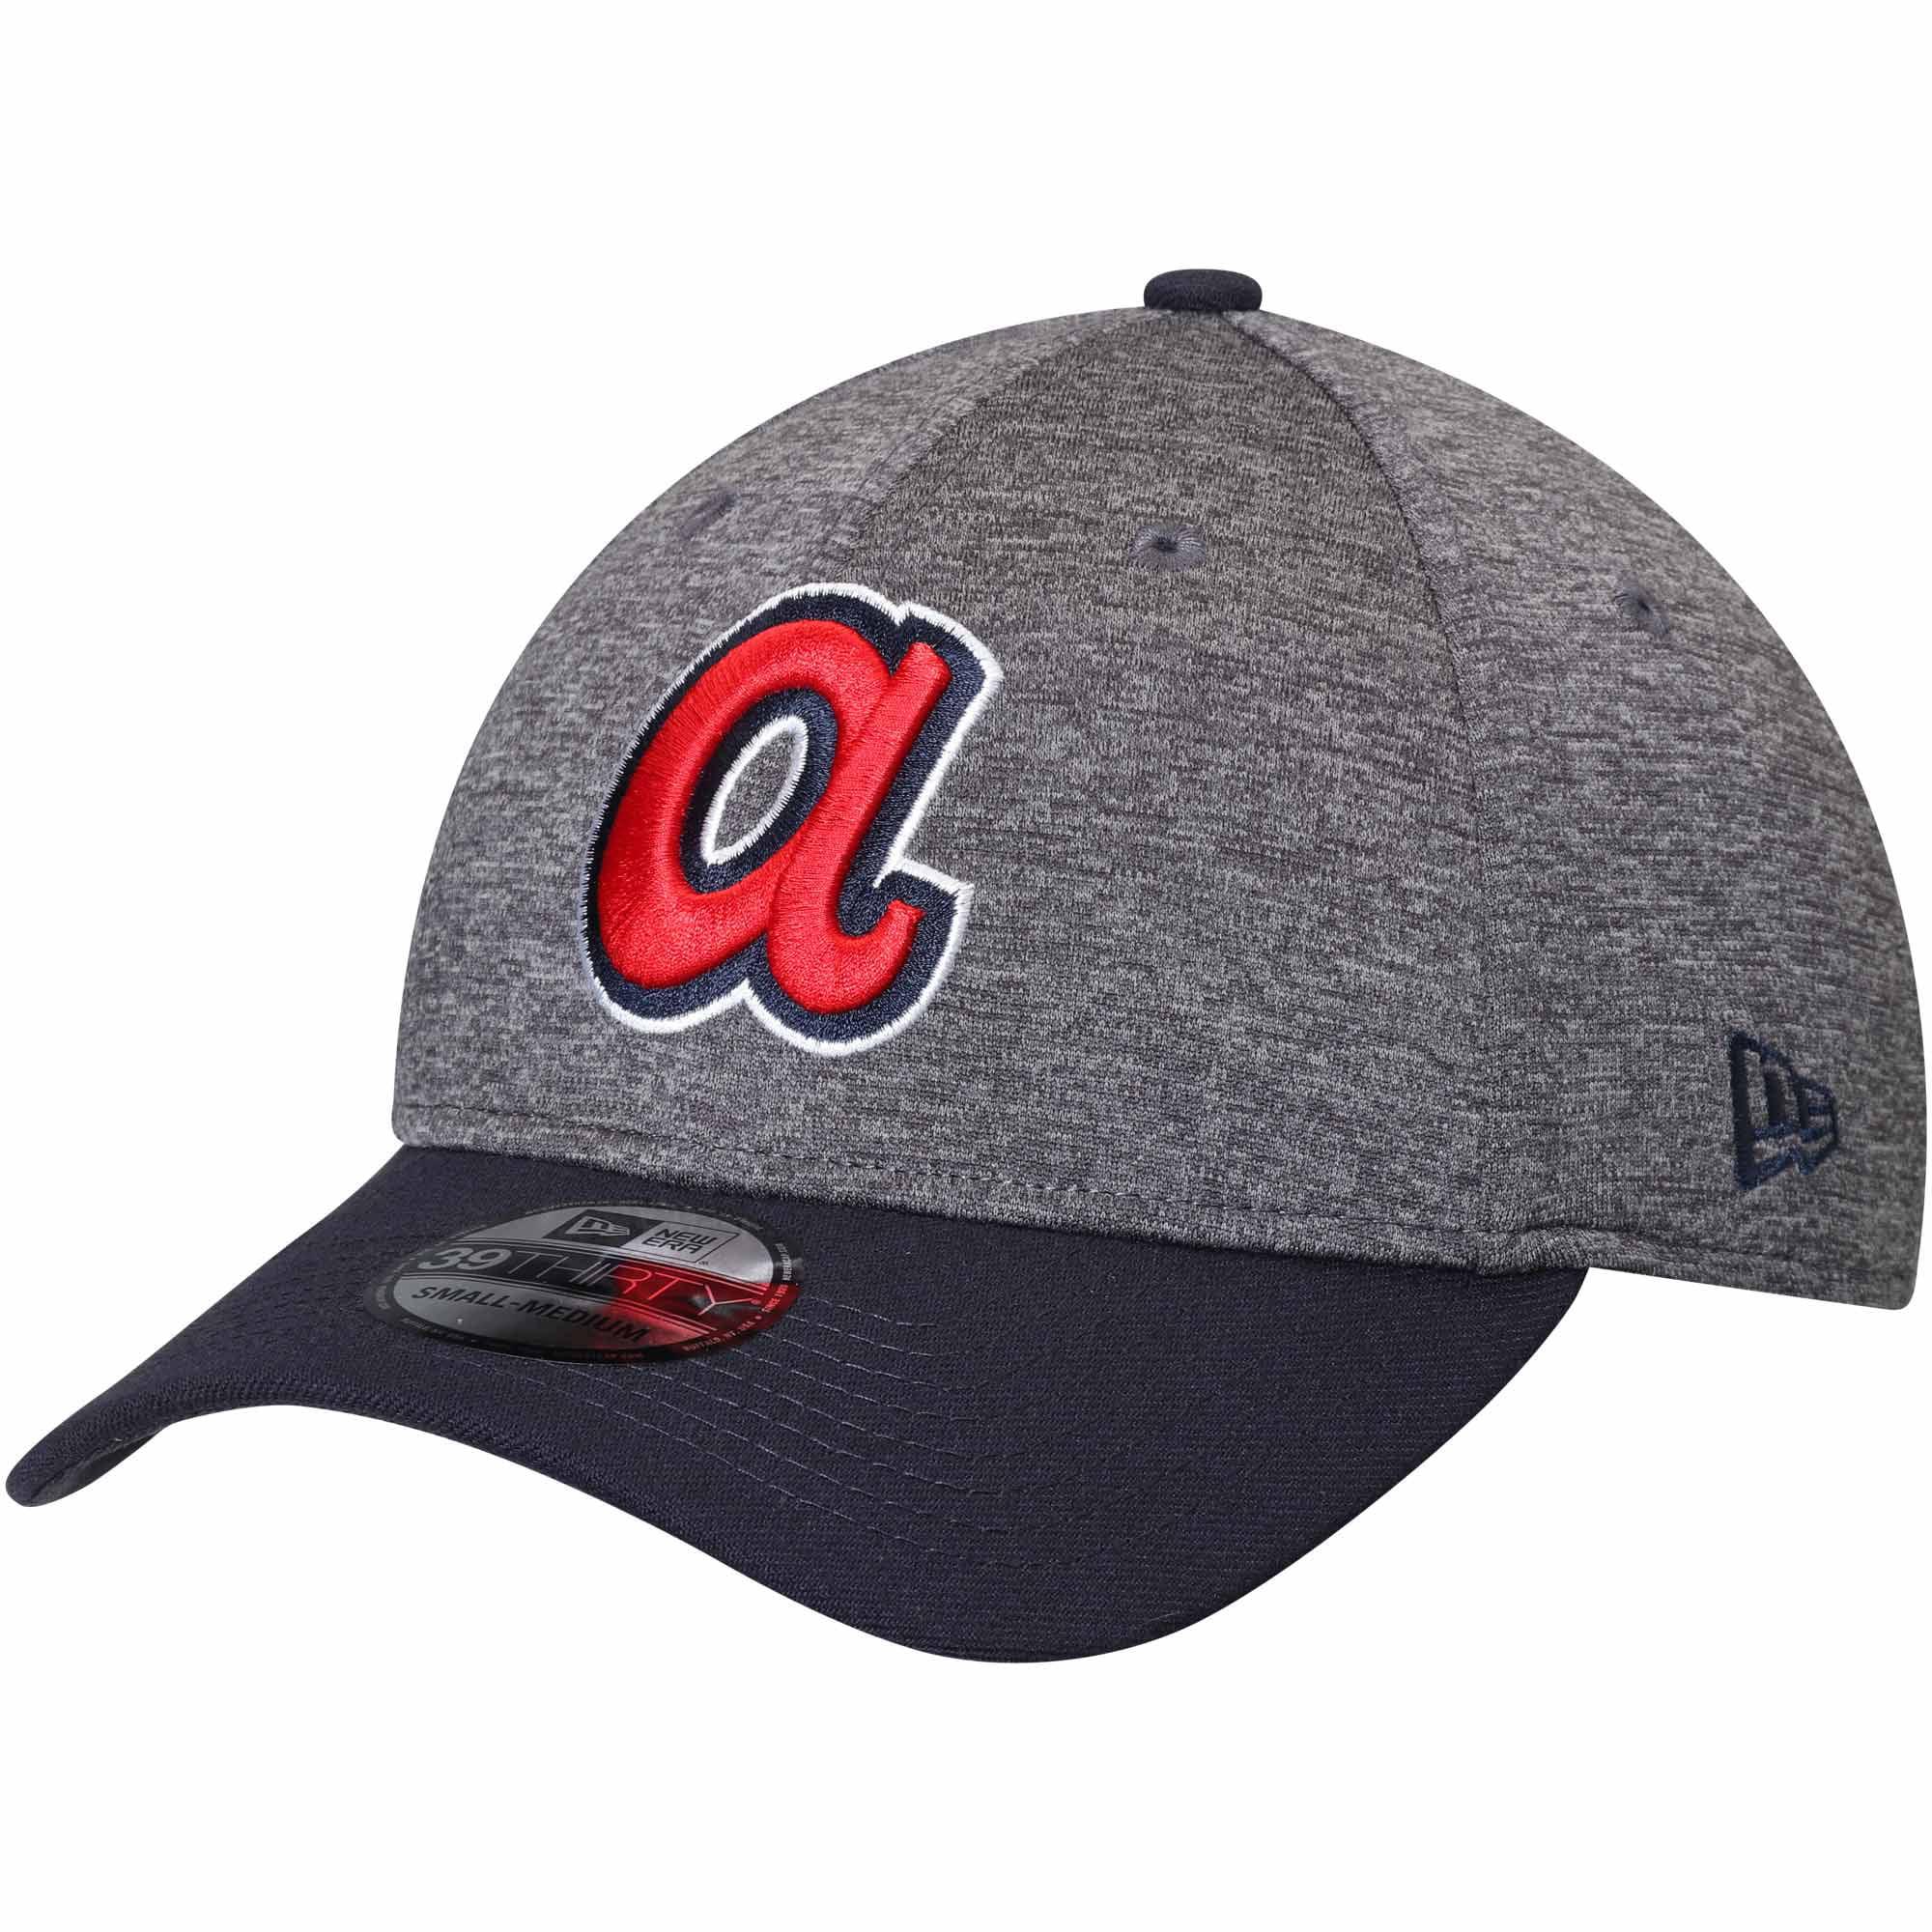 Atlanta Braves New Era Adult 39THIRTY Shadow Tech Flex Hat - Heathered Gray/Navy